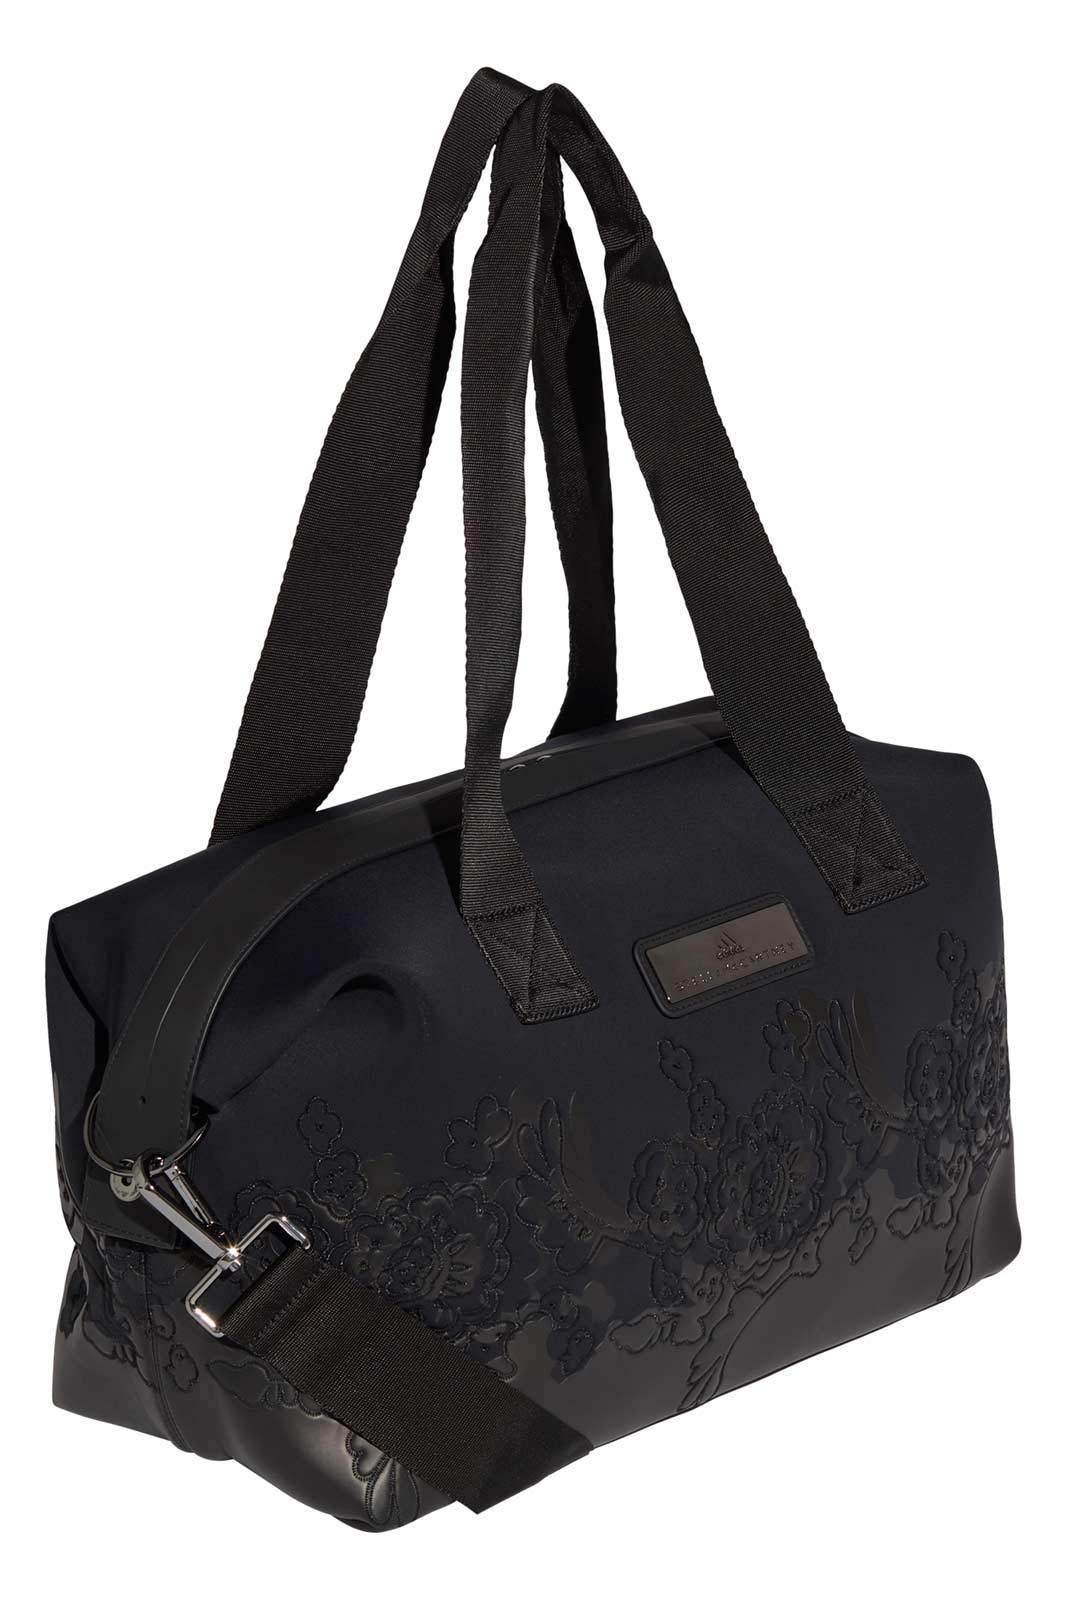 67aa94e77b51 Adidas By Stella McCartney - Black The Studio Bag - Lyst. View fullscreen